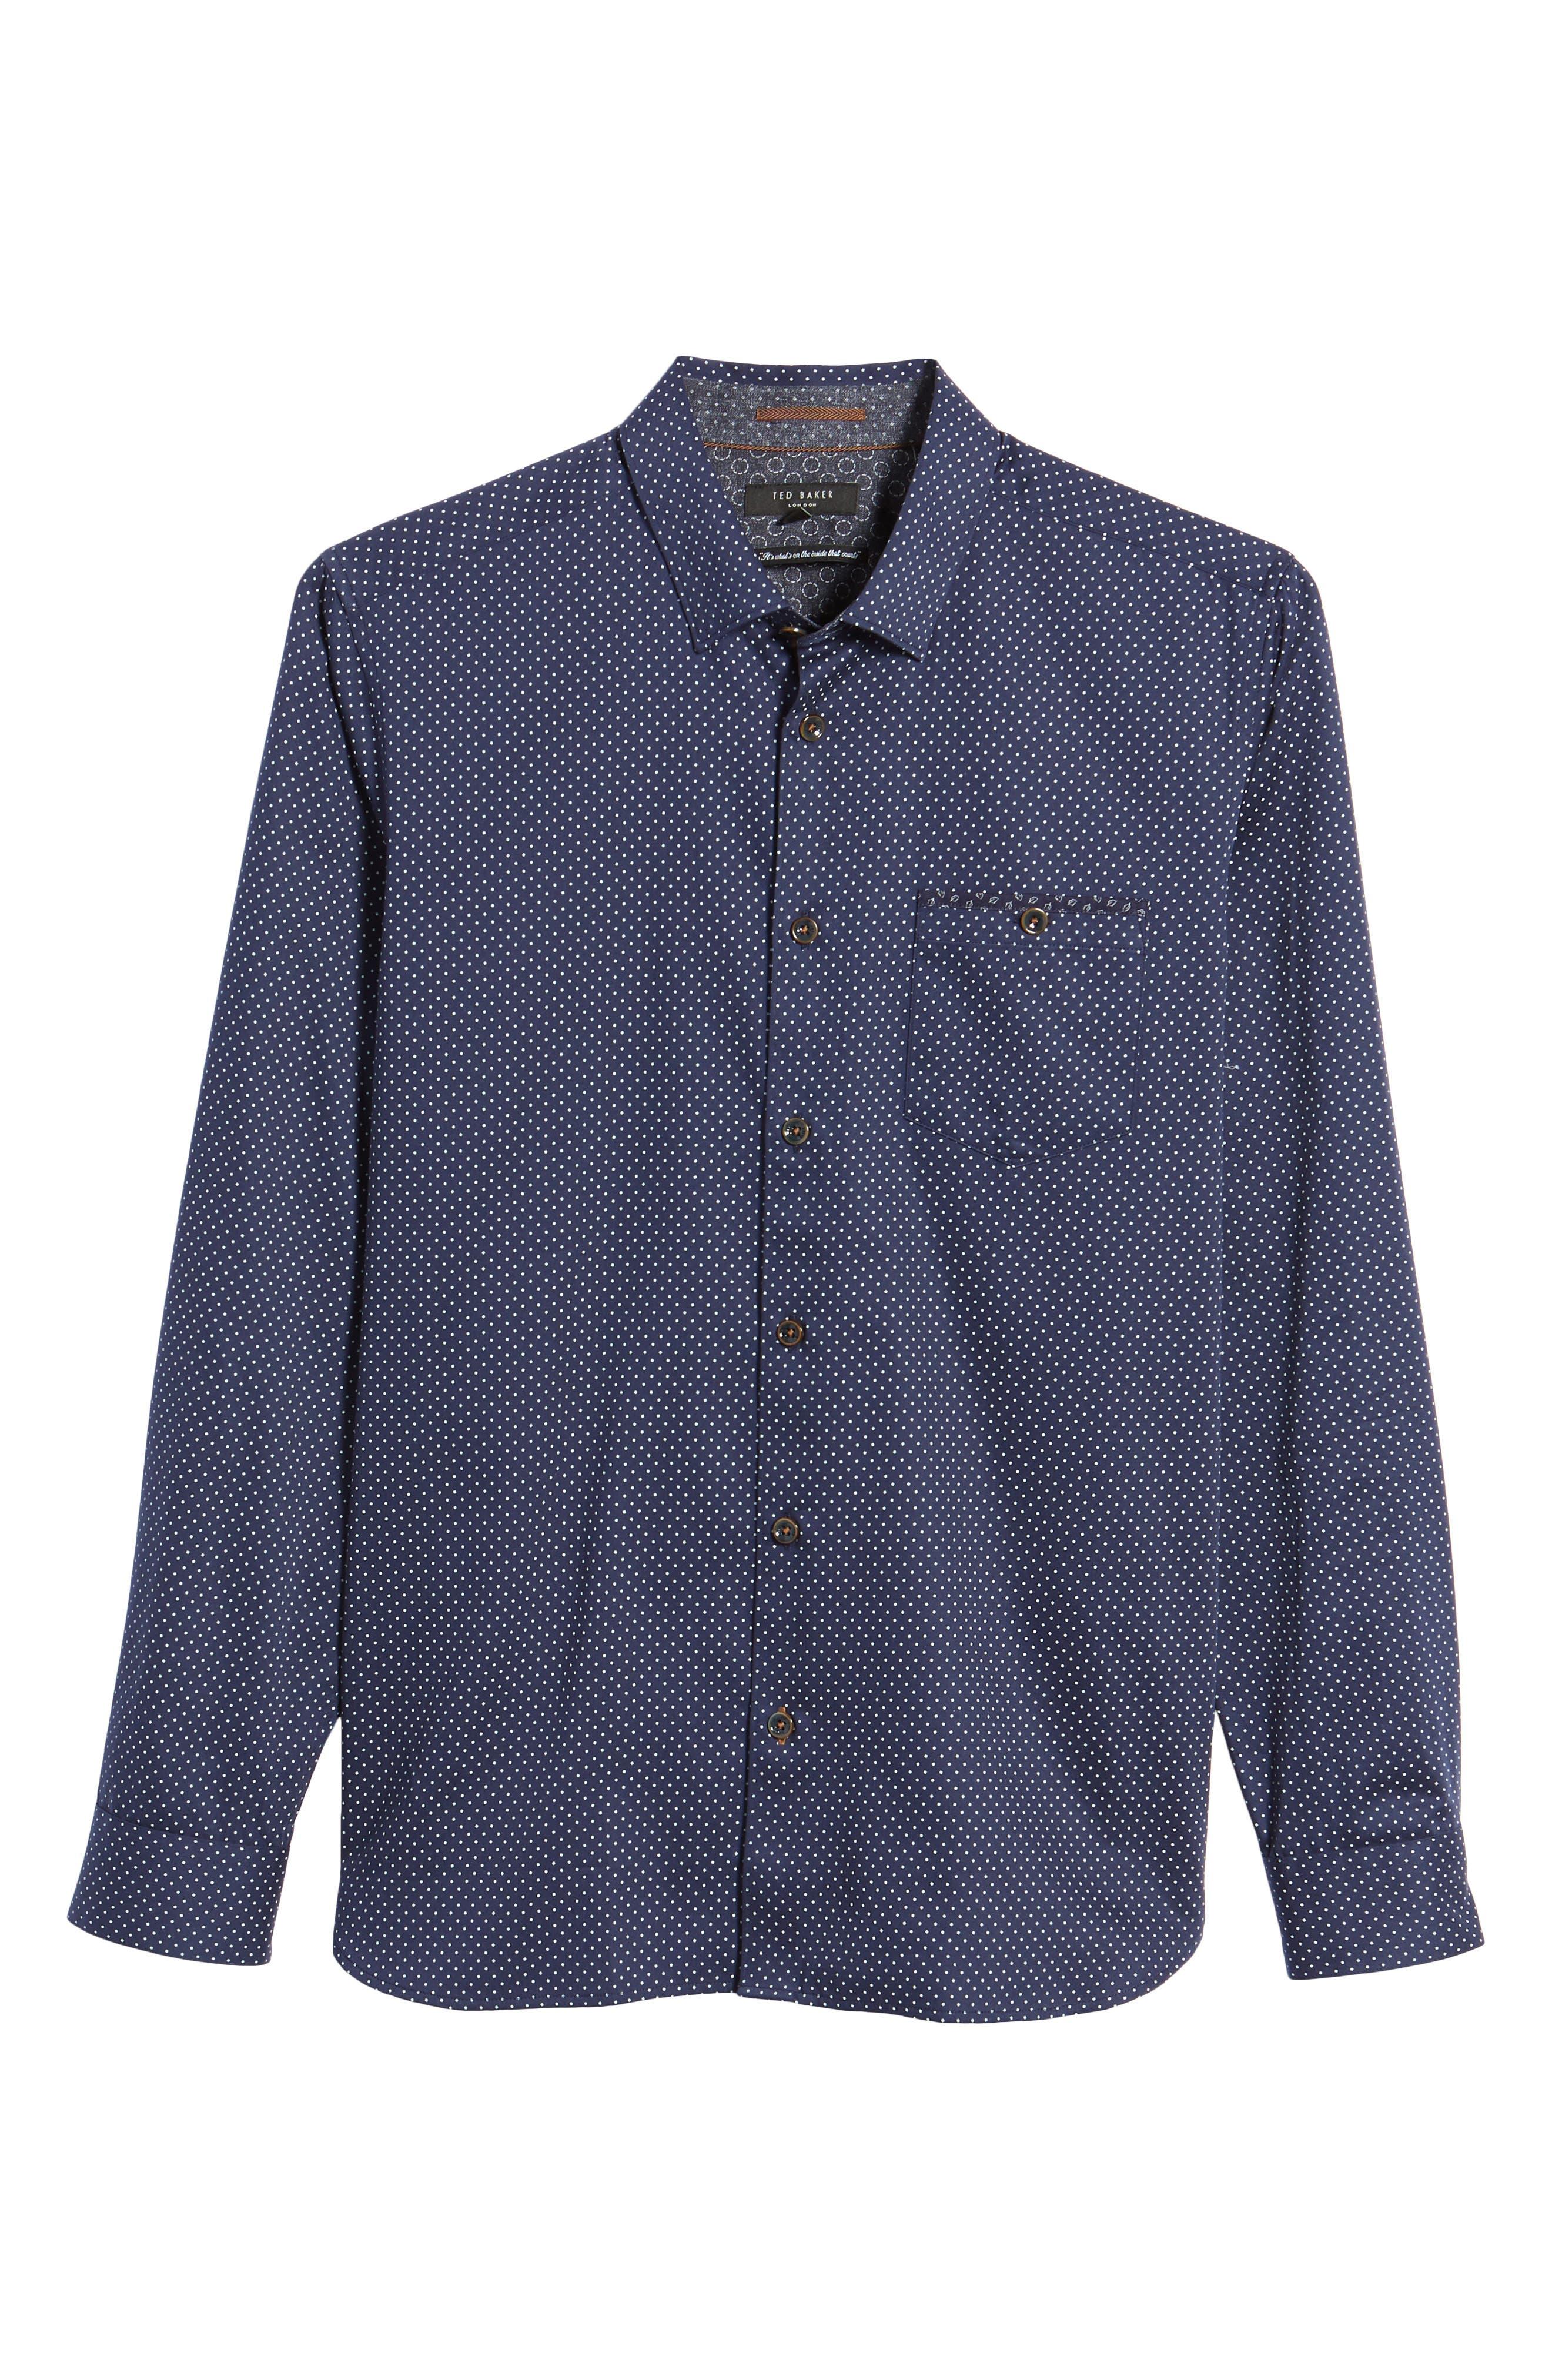 Skwere Trim Fit Sport Shirt,                             Alternate thumbnail 5, color,                             Navy